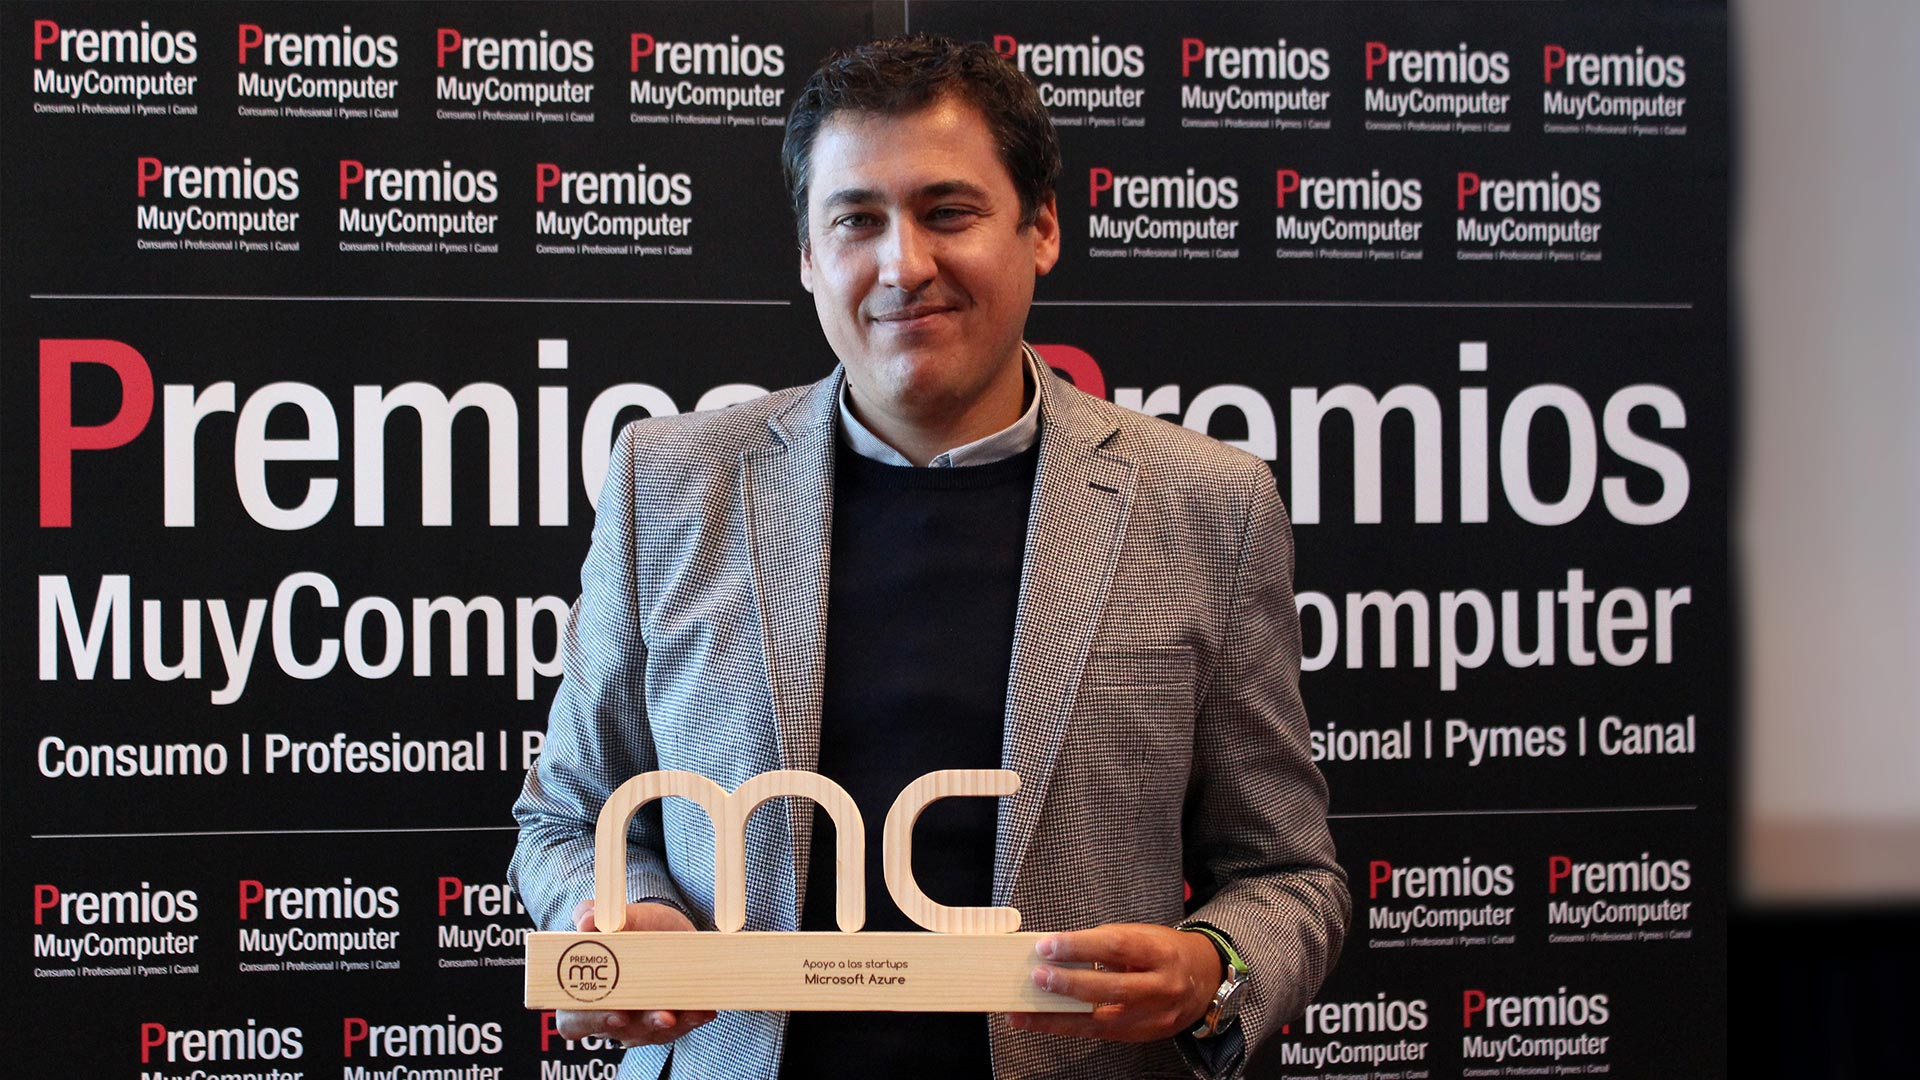 premiosmc2016-apoyo-startups-microsoft-azure